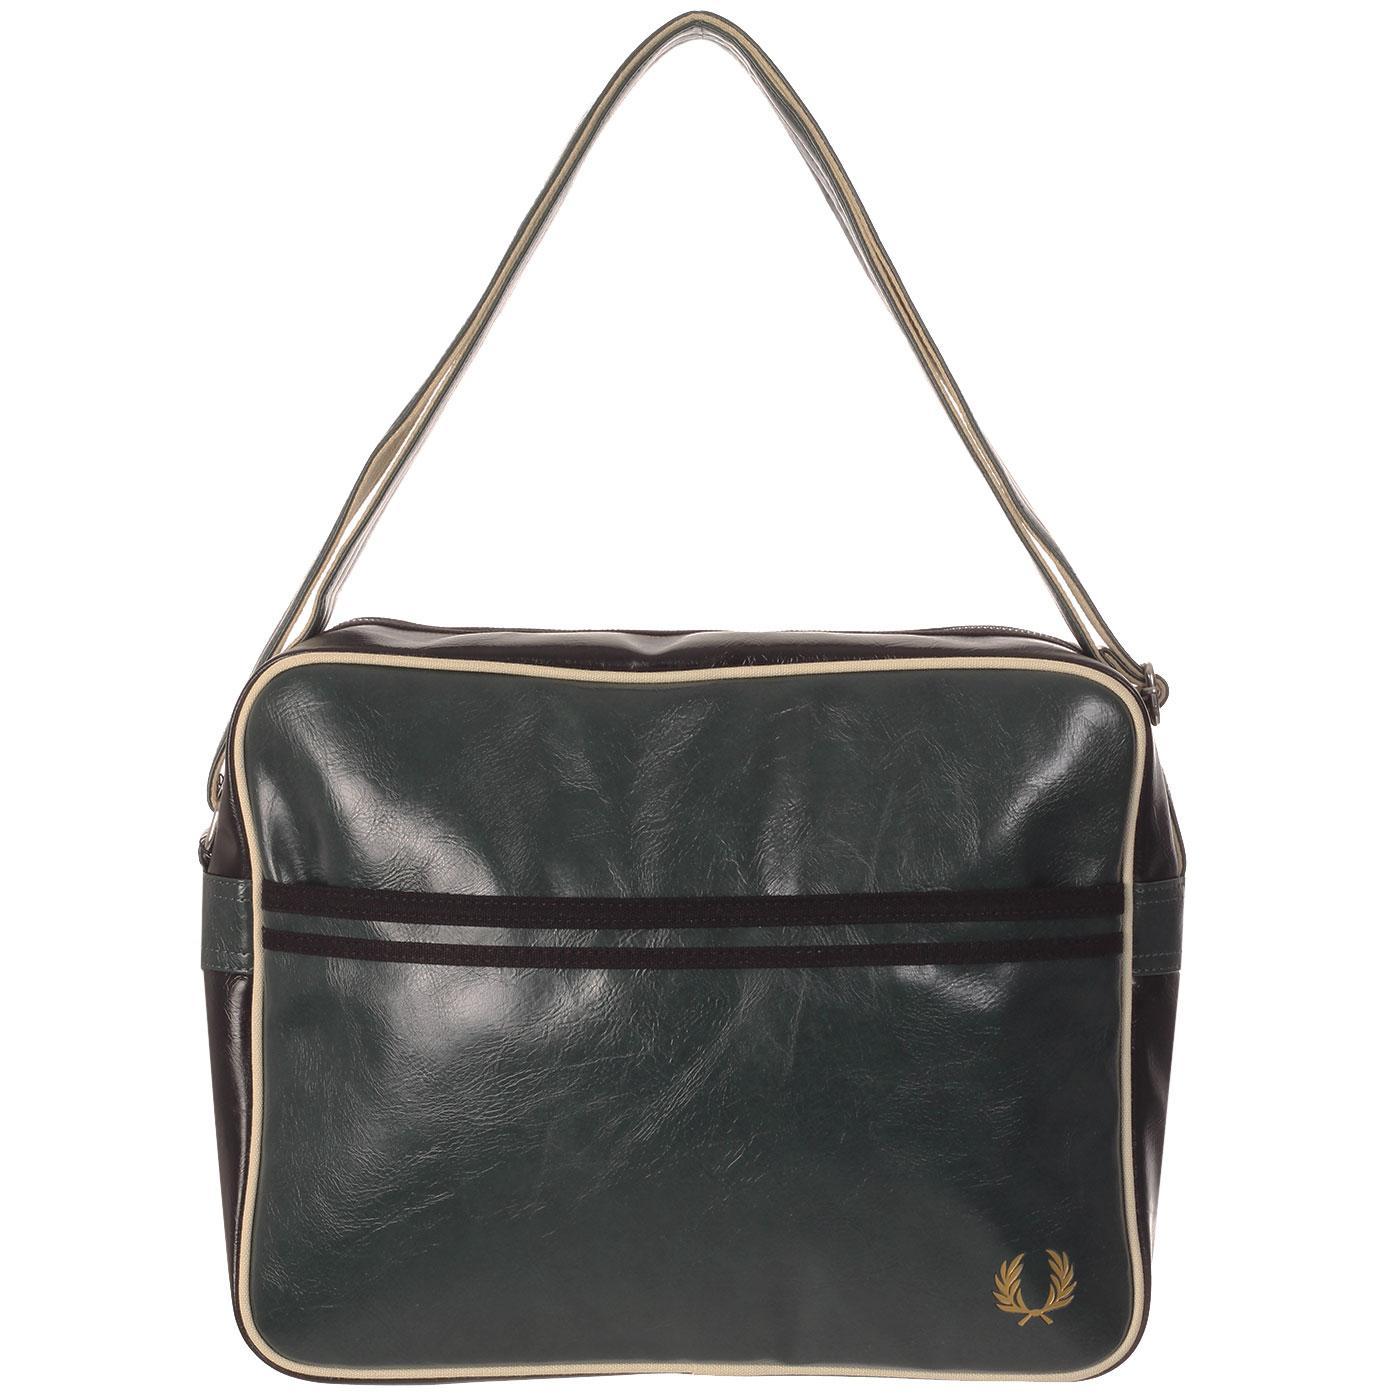 FRED PERRY Retro Classic Shoulder Bag - Ivy/Black